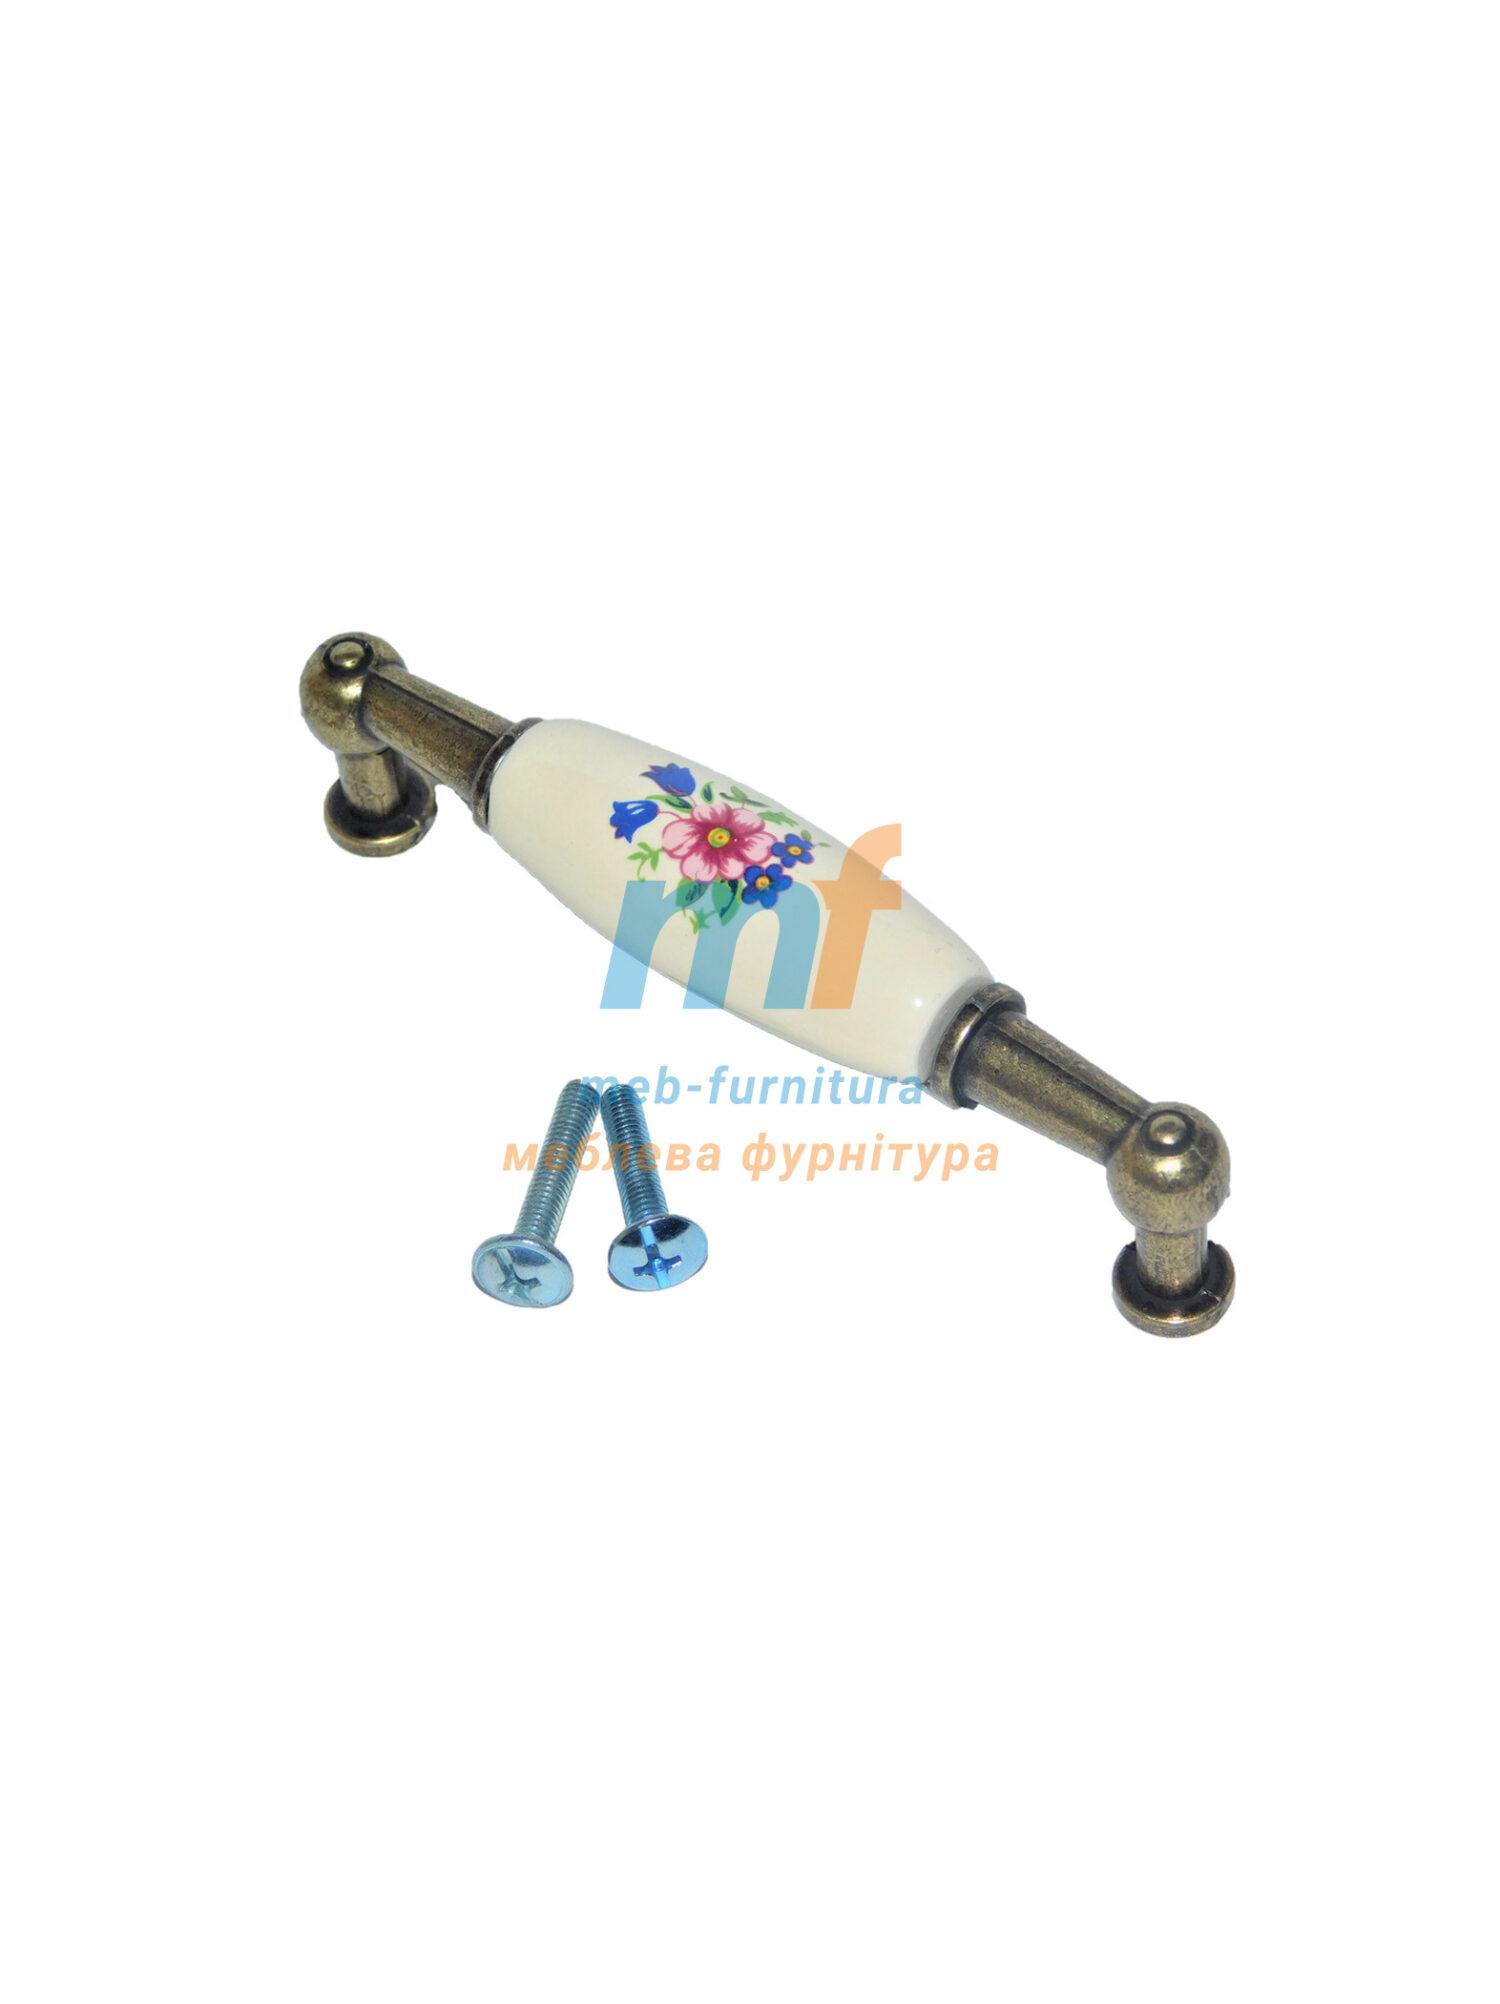 Ручка мебельная керамика KR-06-96mm